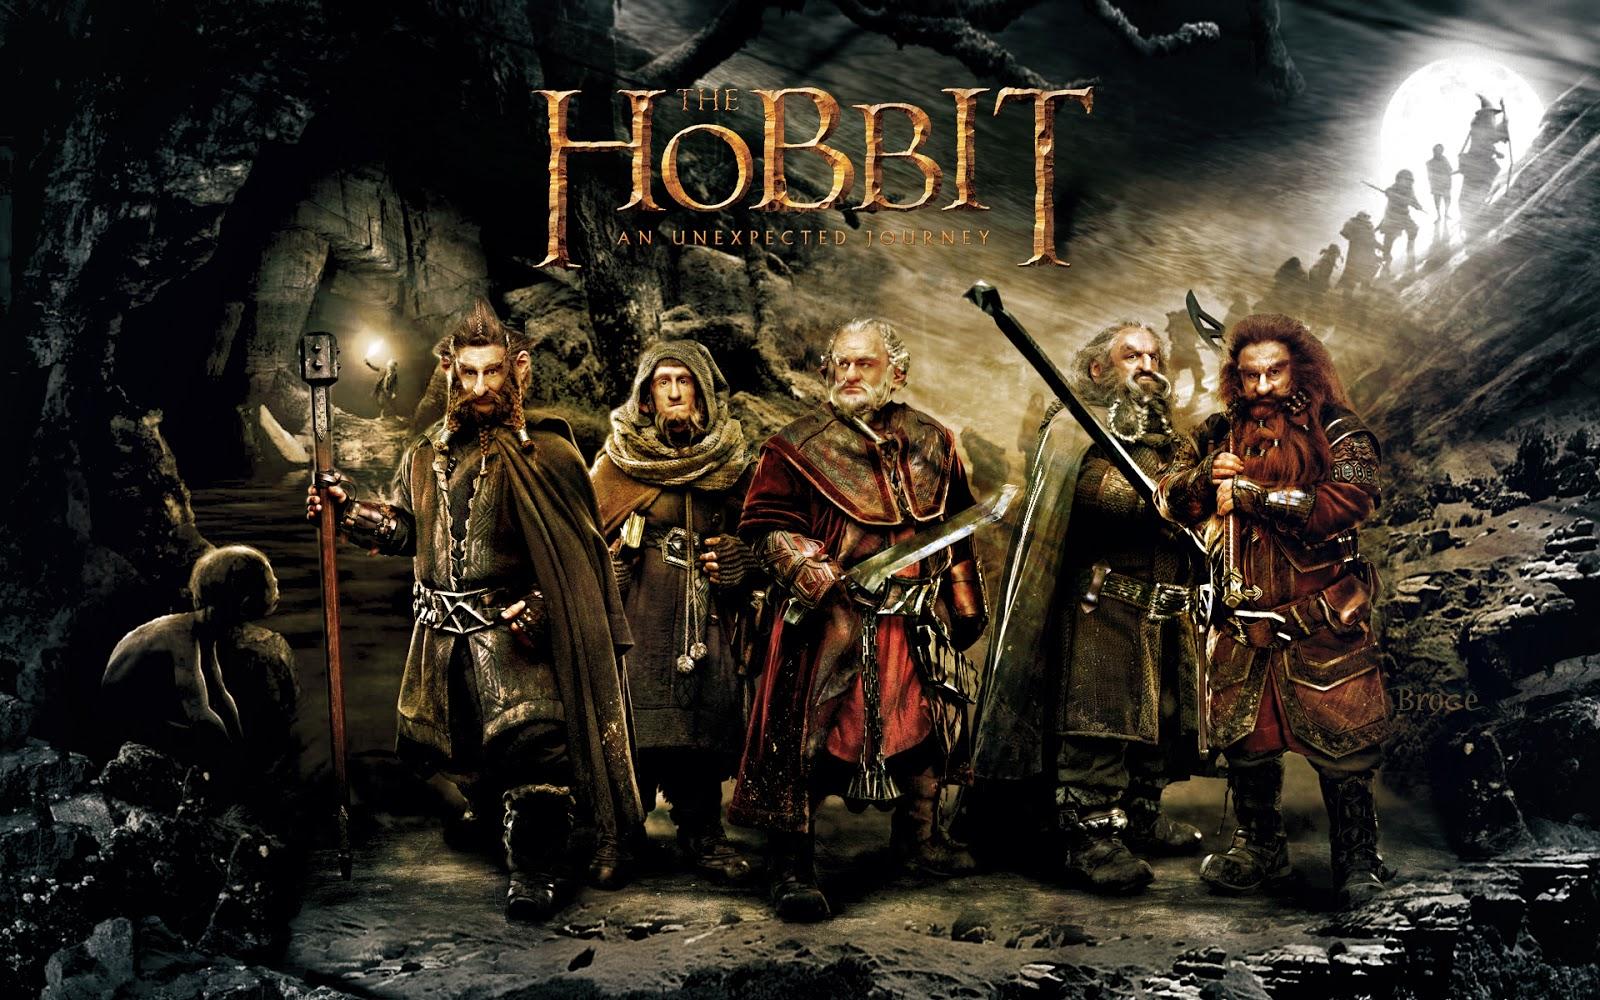 The Hobbit Movie Wallpaper Set 2 2013 Wallpaper 1600x1000